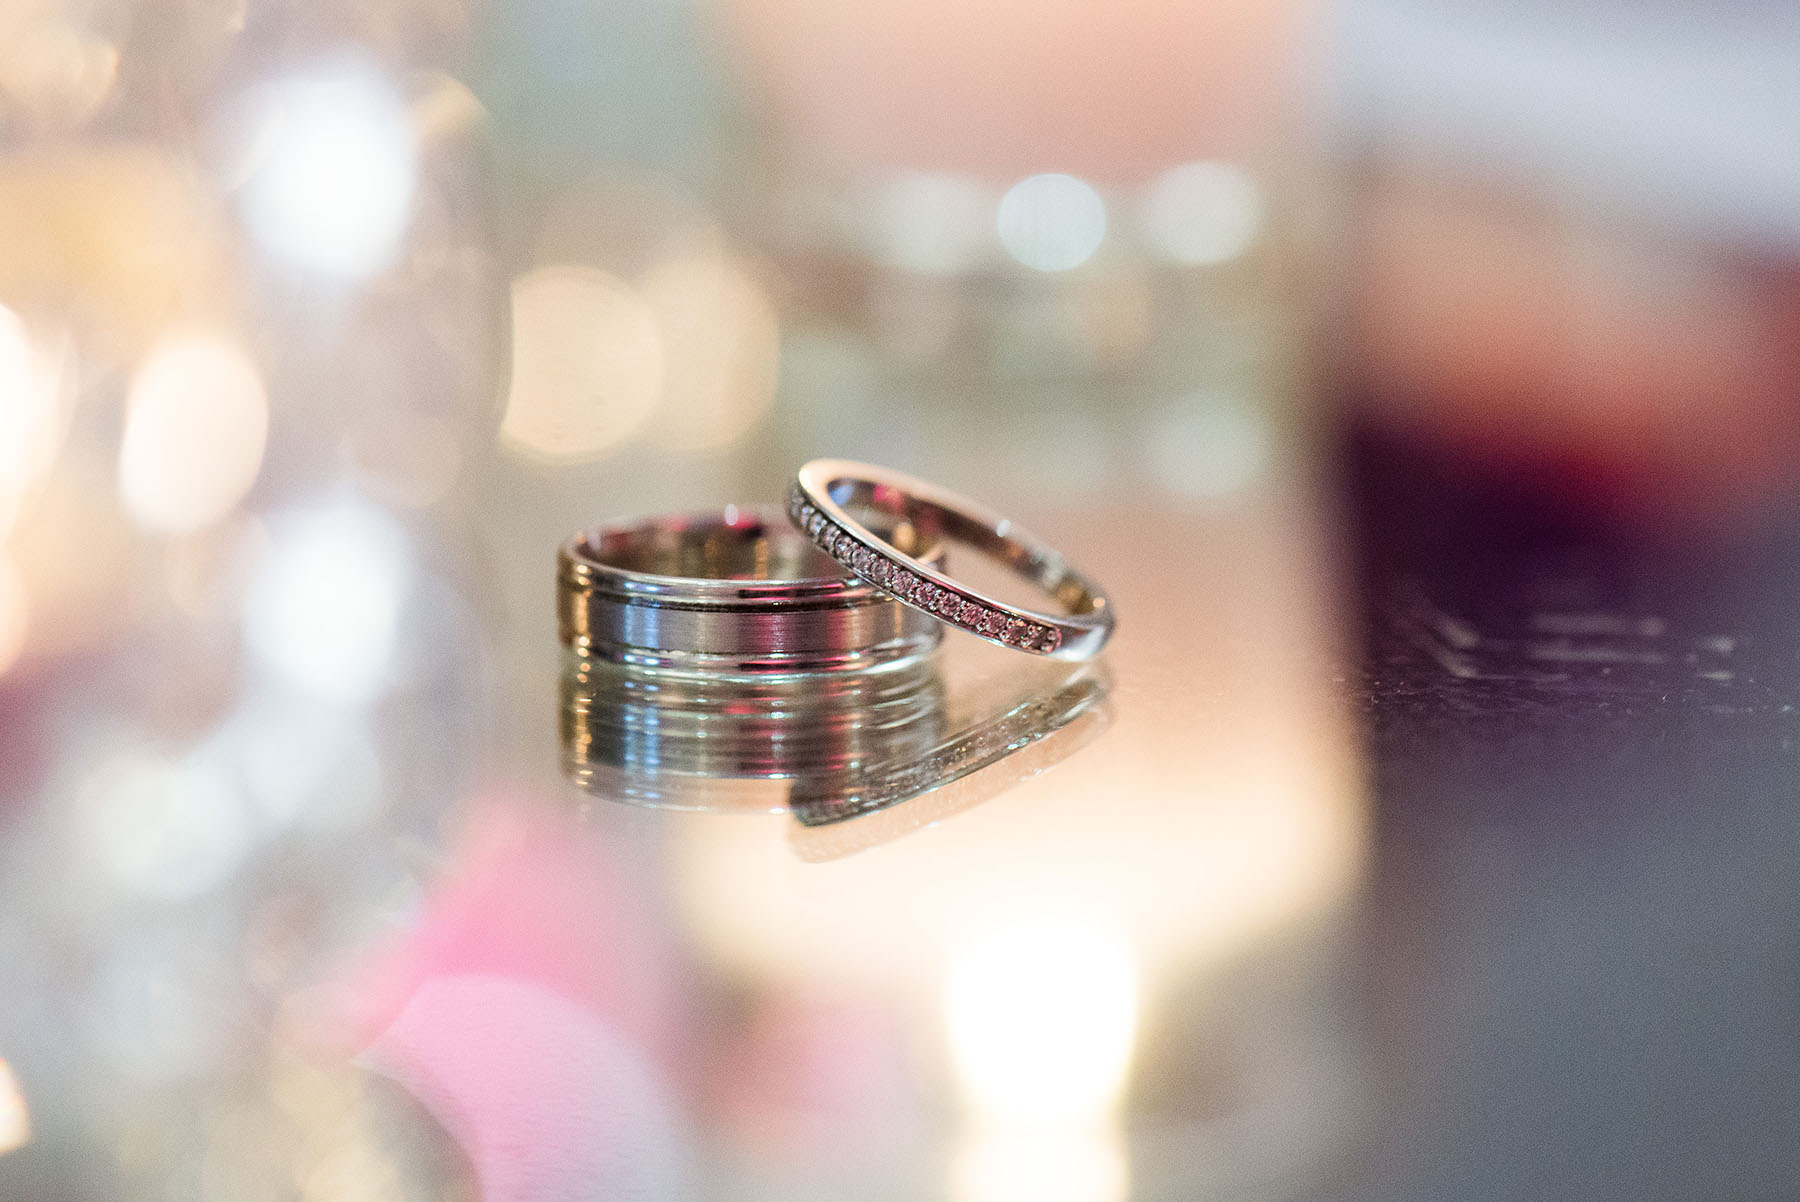 Marryme_wedding_photography_dorrigo_bellingen_photographer_2.jpg